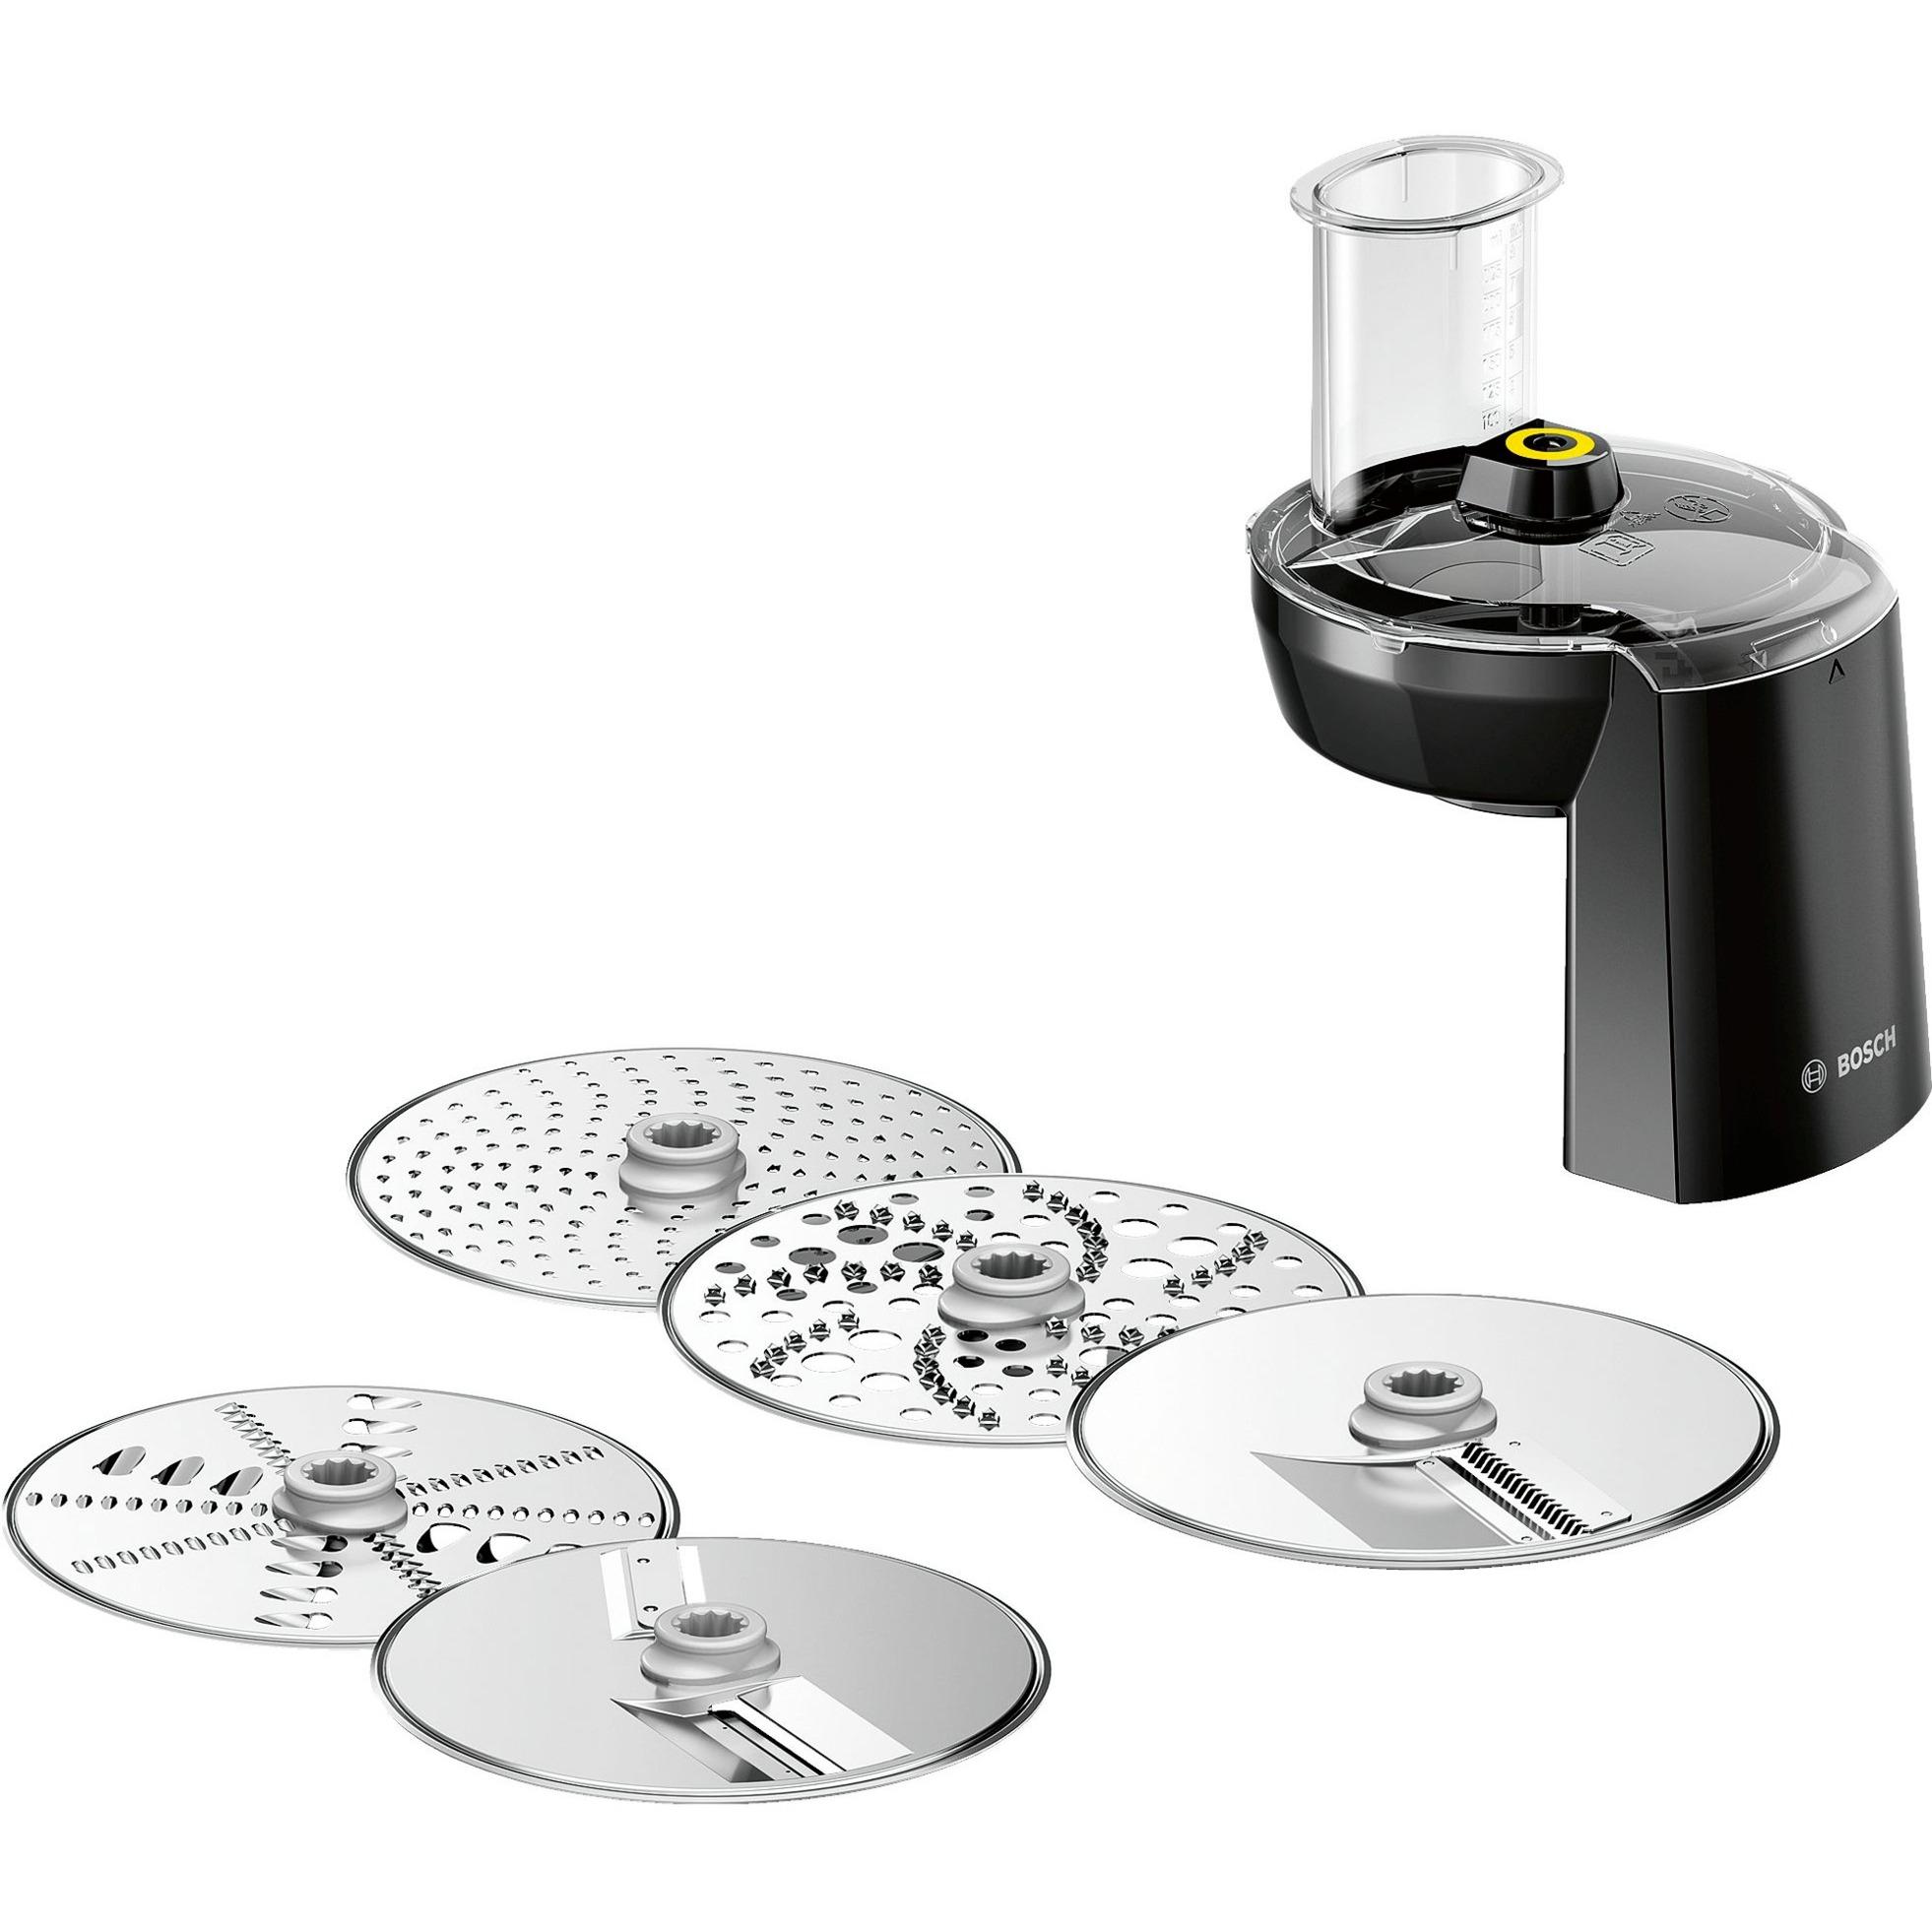 Elettrodomestico da cucina robot da cucina general shopping - Lavorare in cucina ...